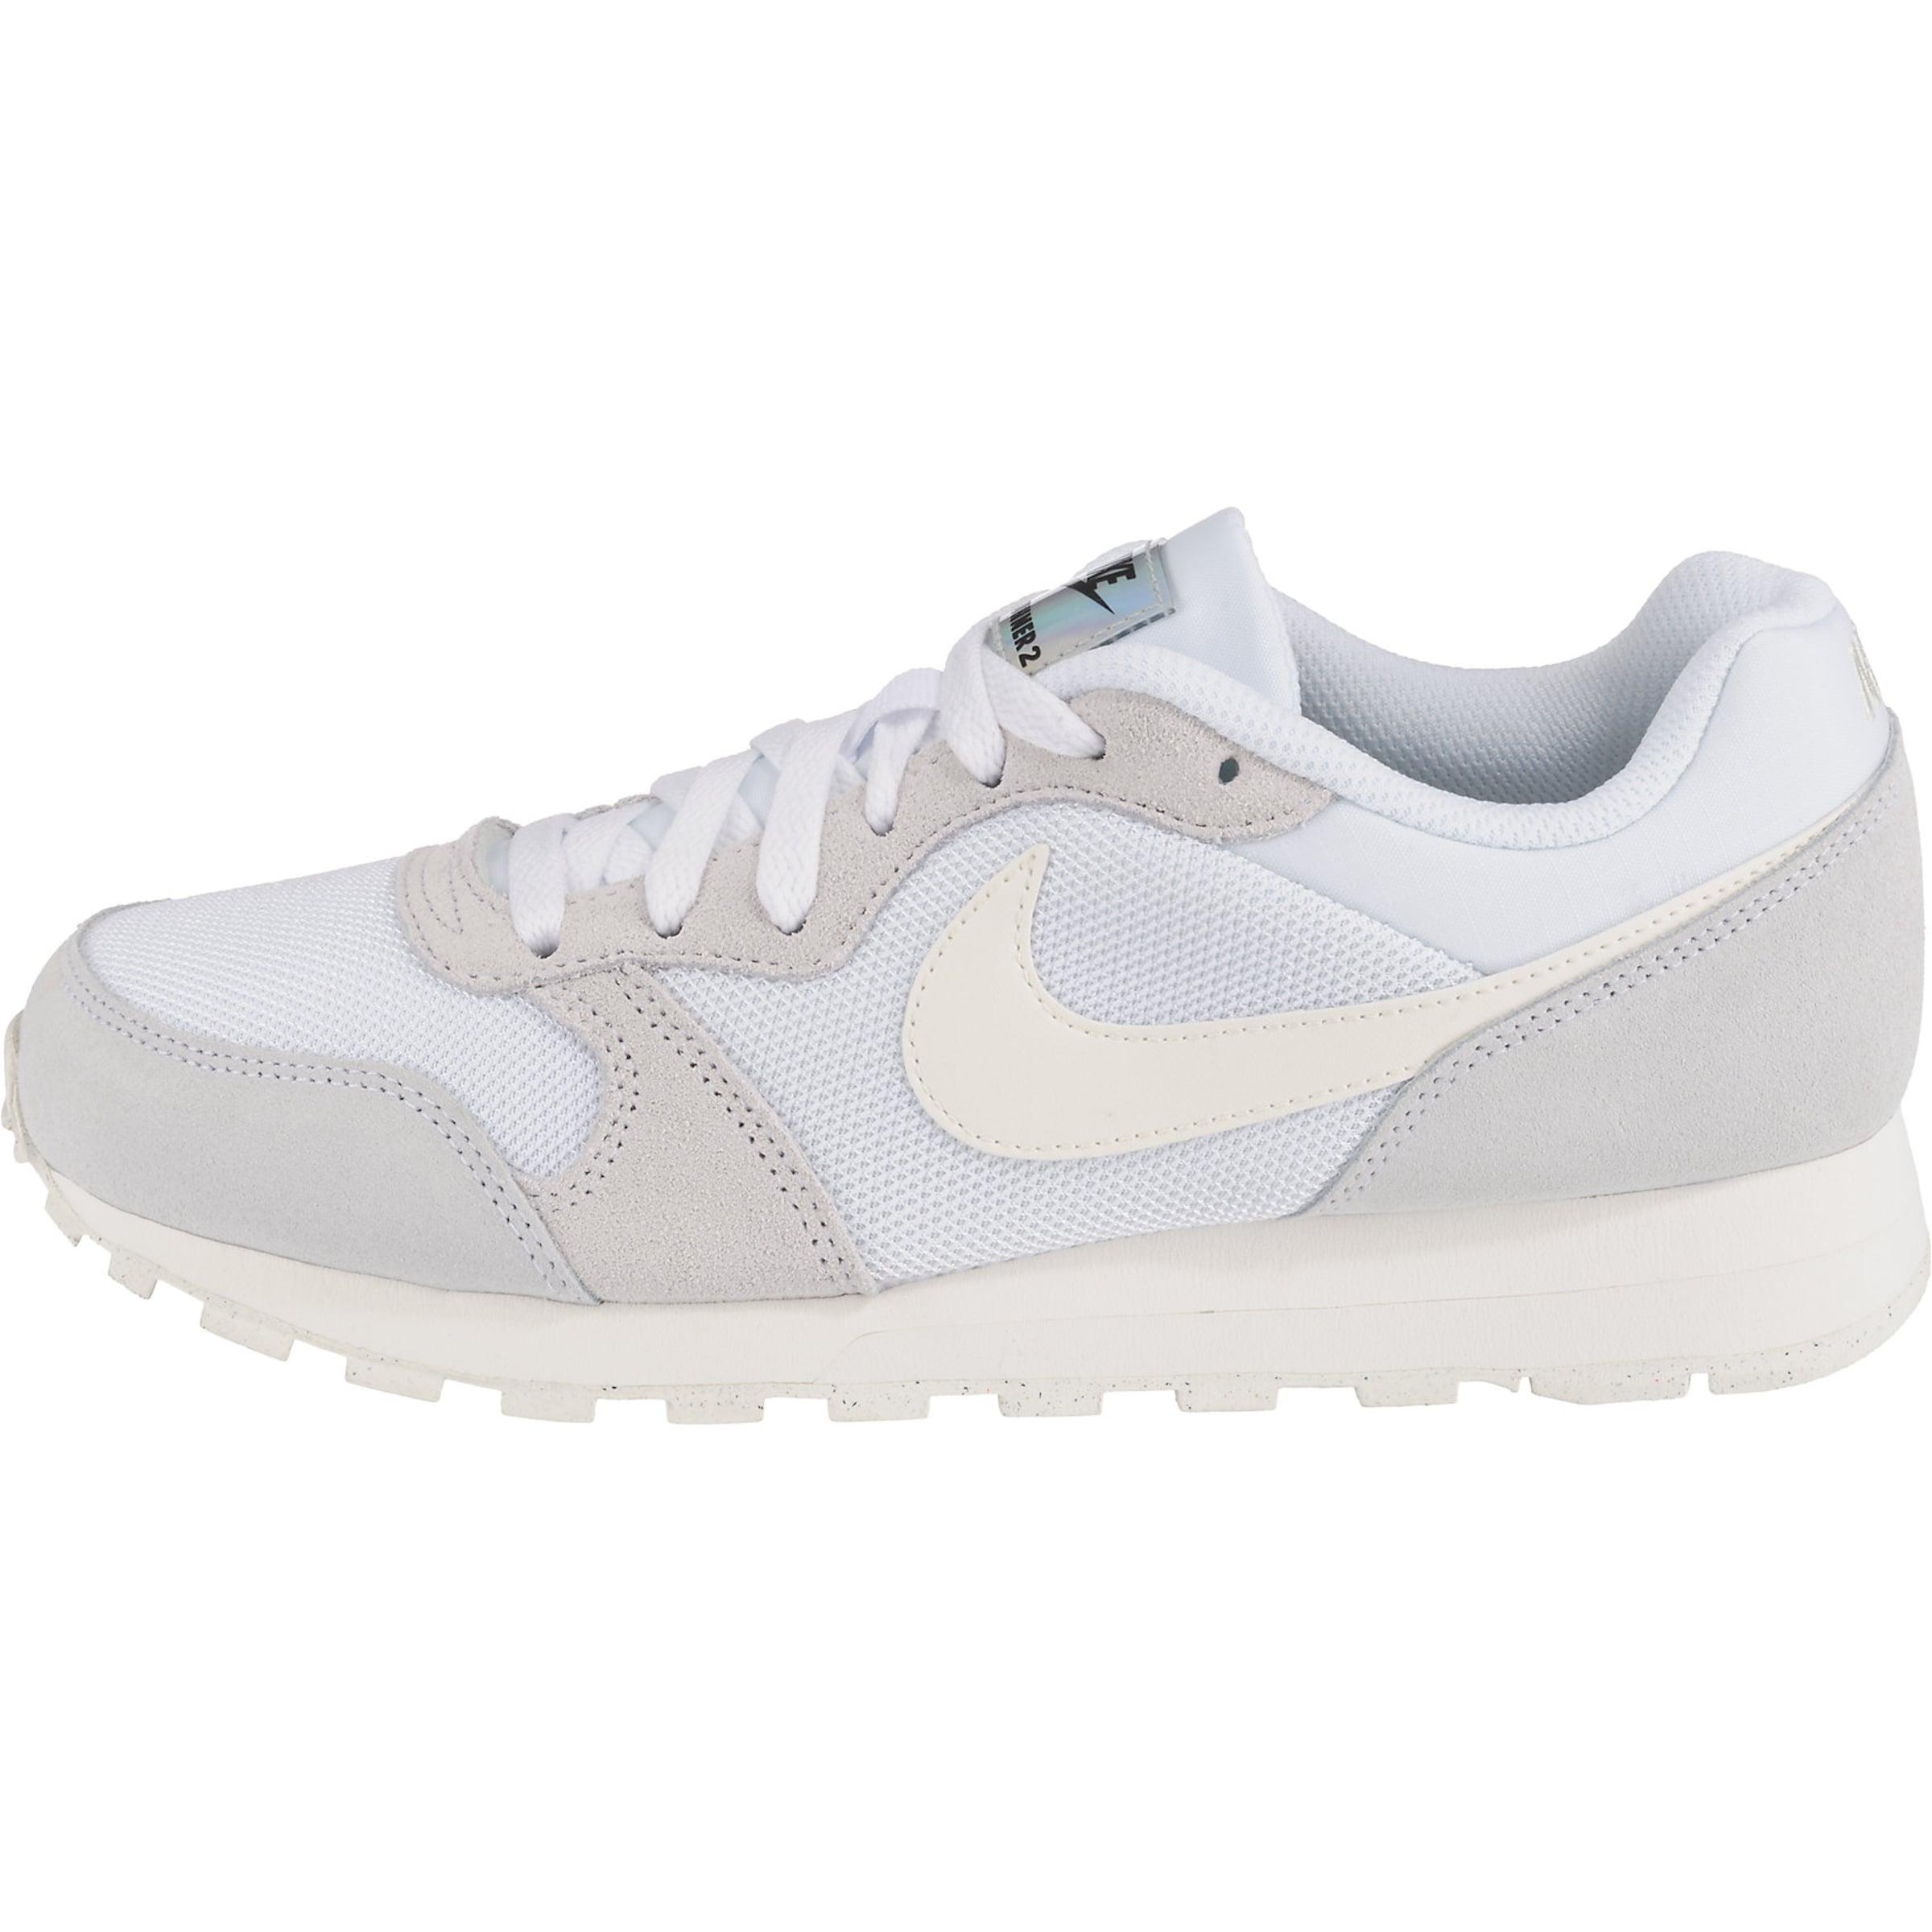 'runner 2' Sportswear In Sneaker Nike HellgrauOffwhite Naturweiß 6g7yfbY